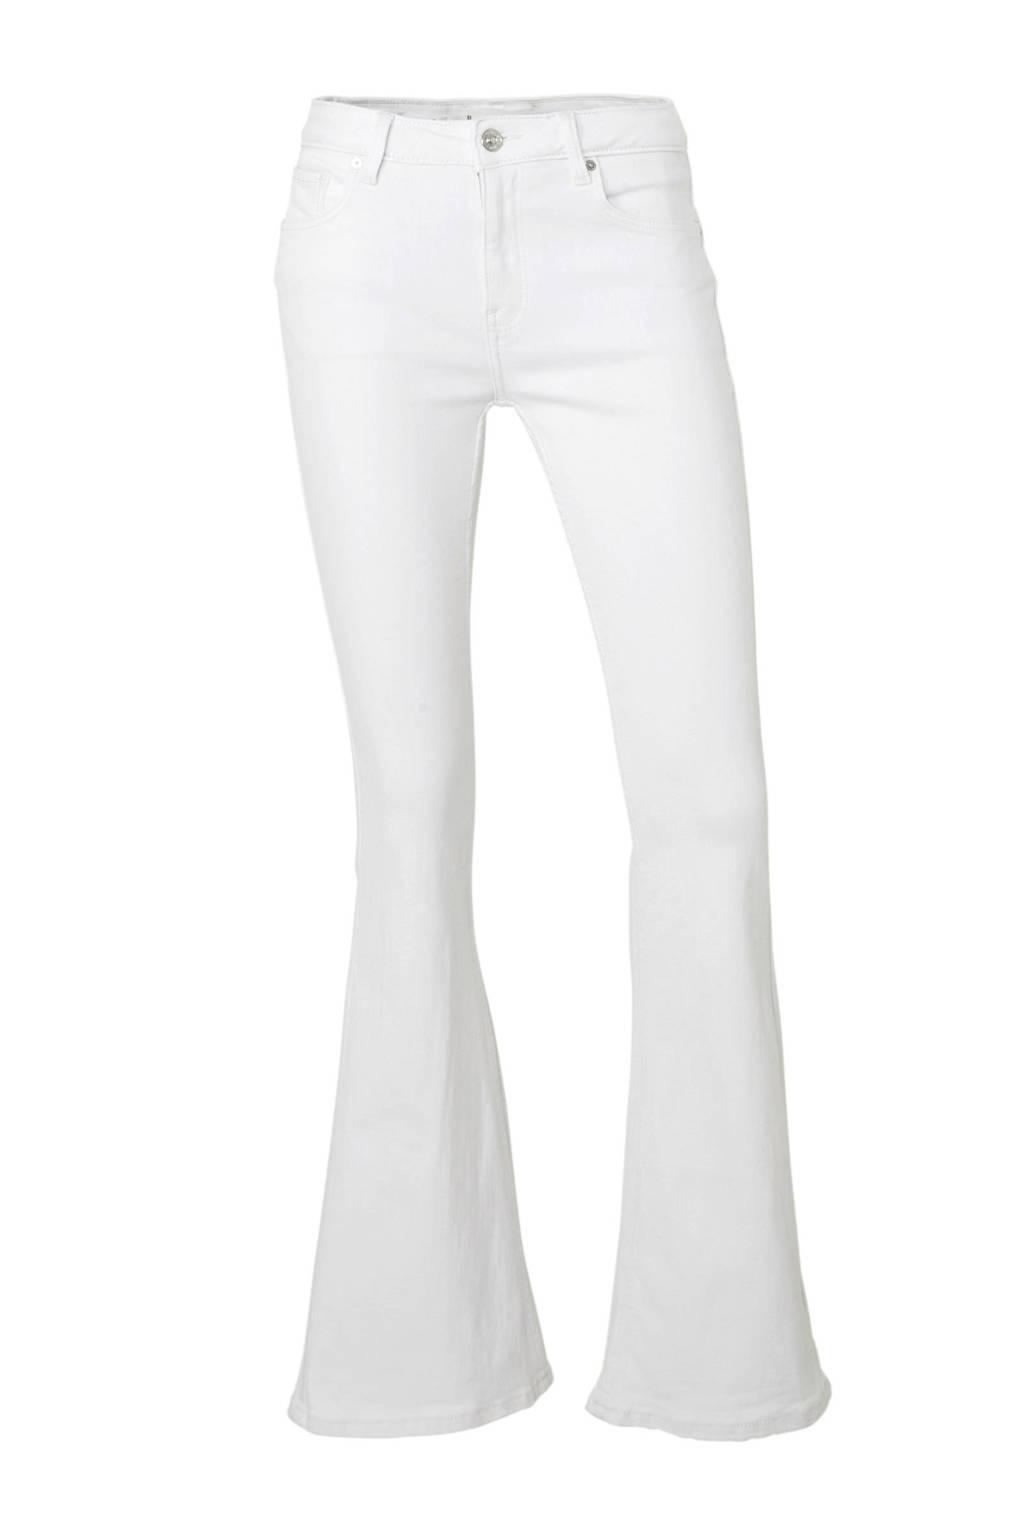 Mango high waist flared jeans, Wit